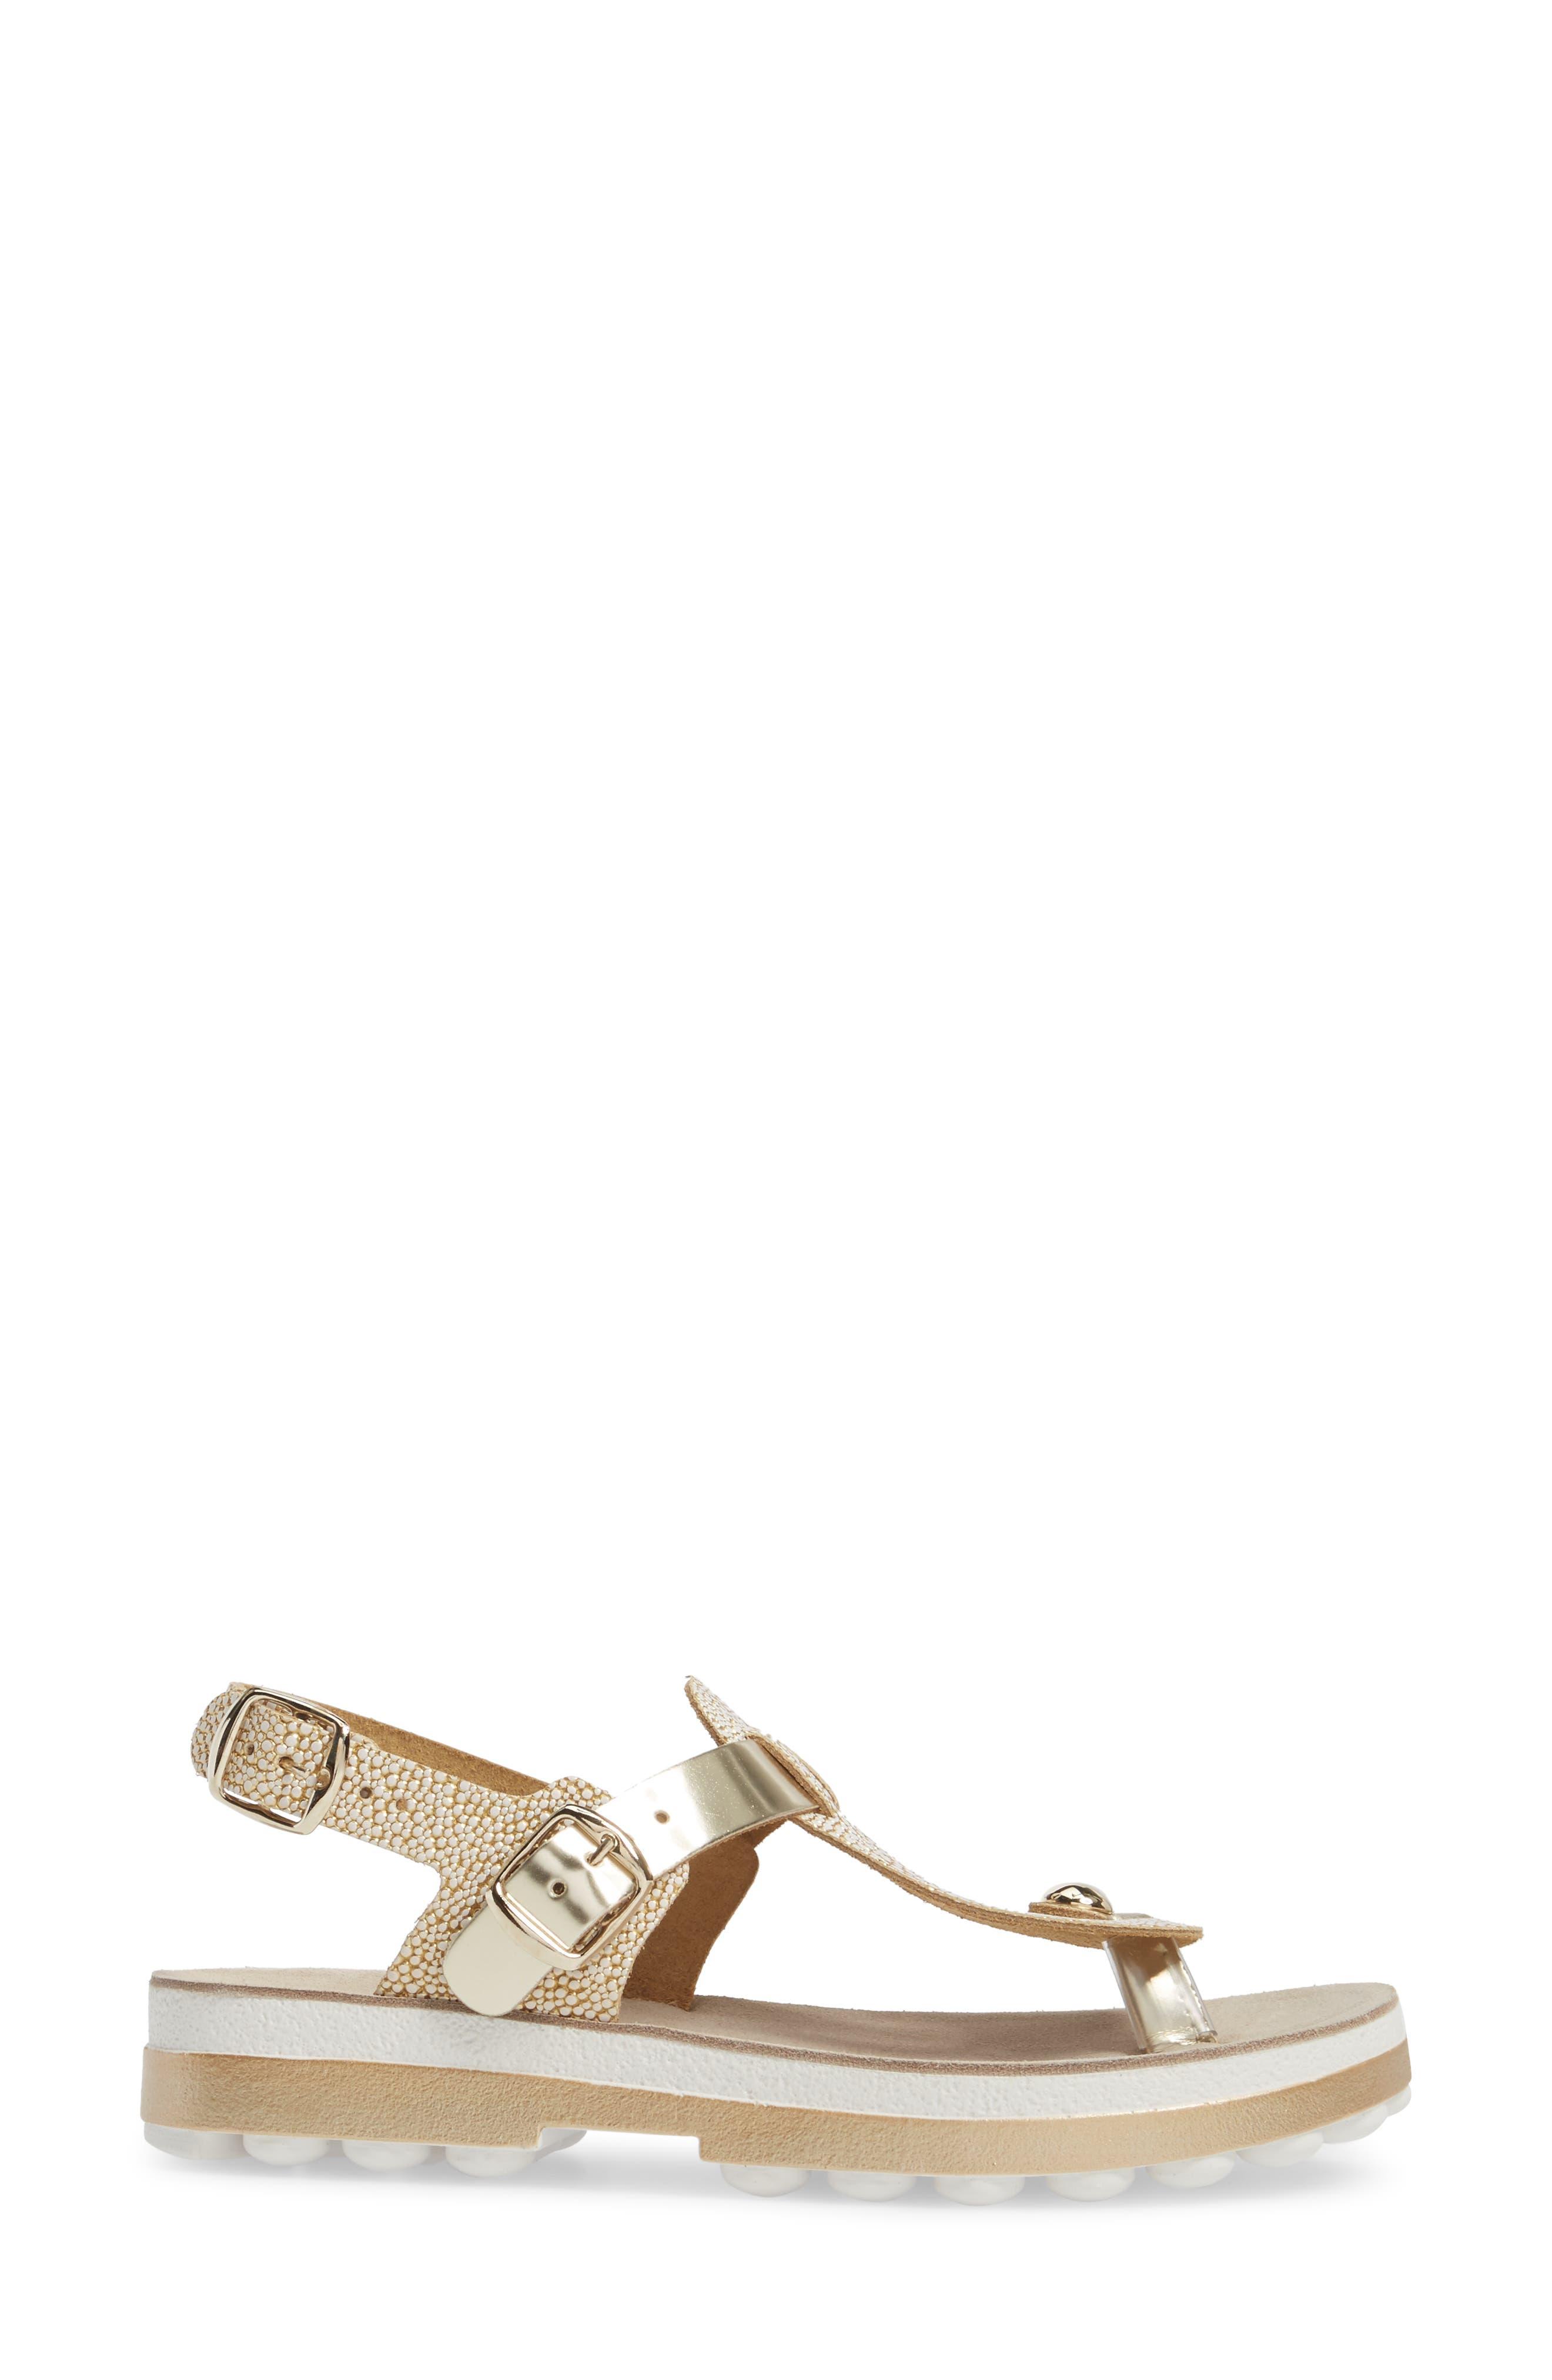 Marlena Fantasy Sandal,                             Alternate thumbnail 3, color,                             Gold Caviar Leather